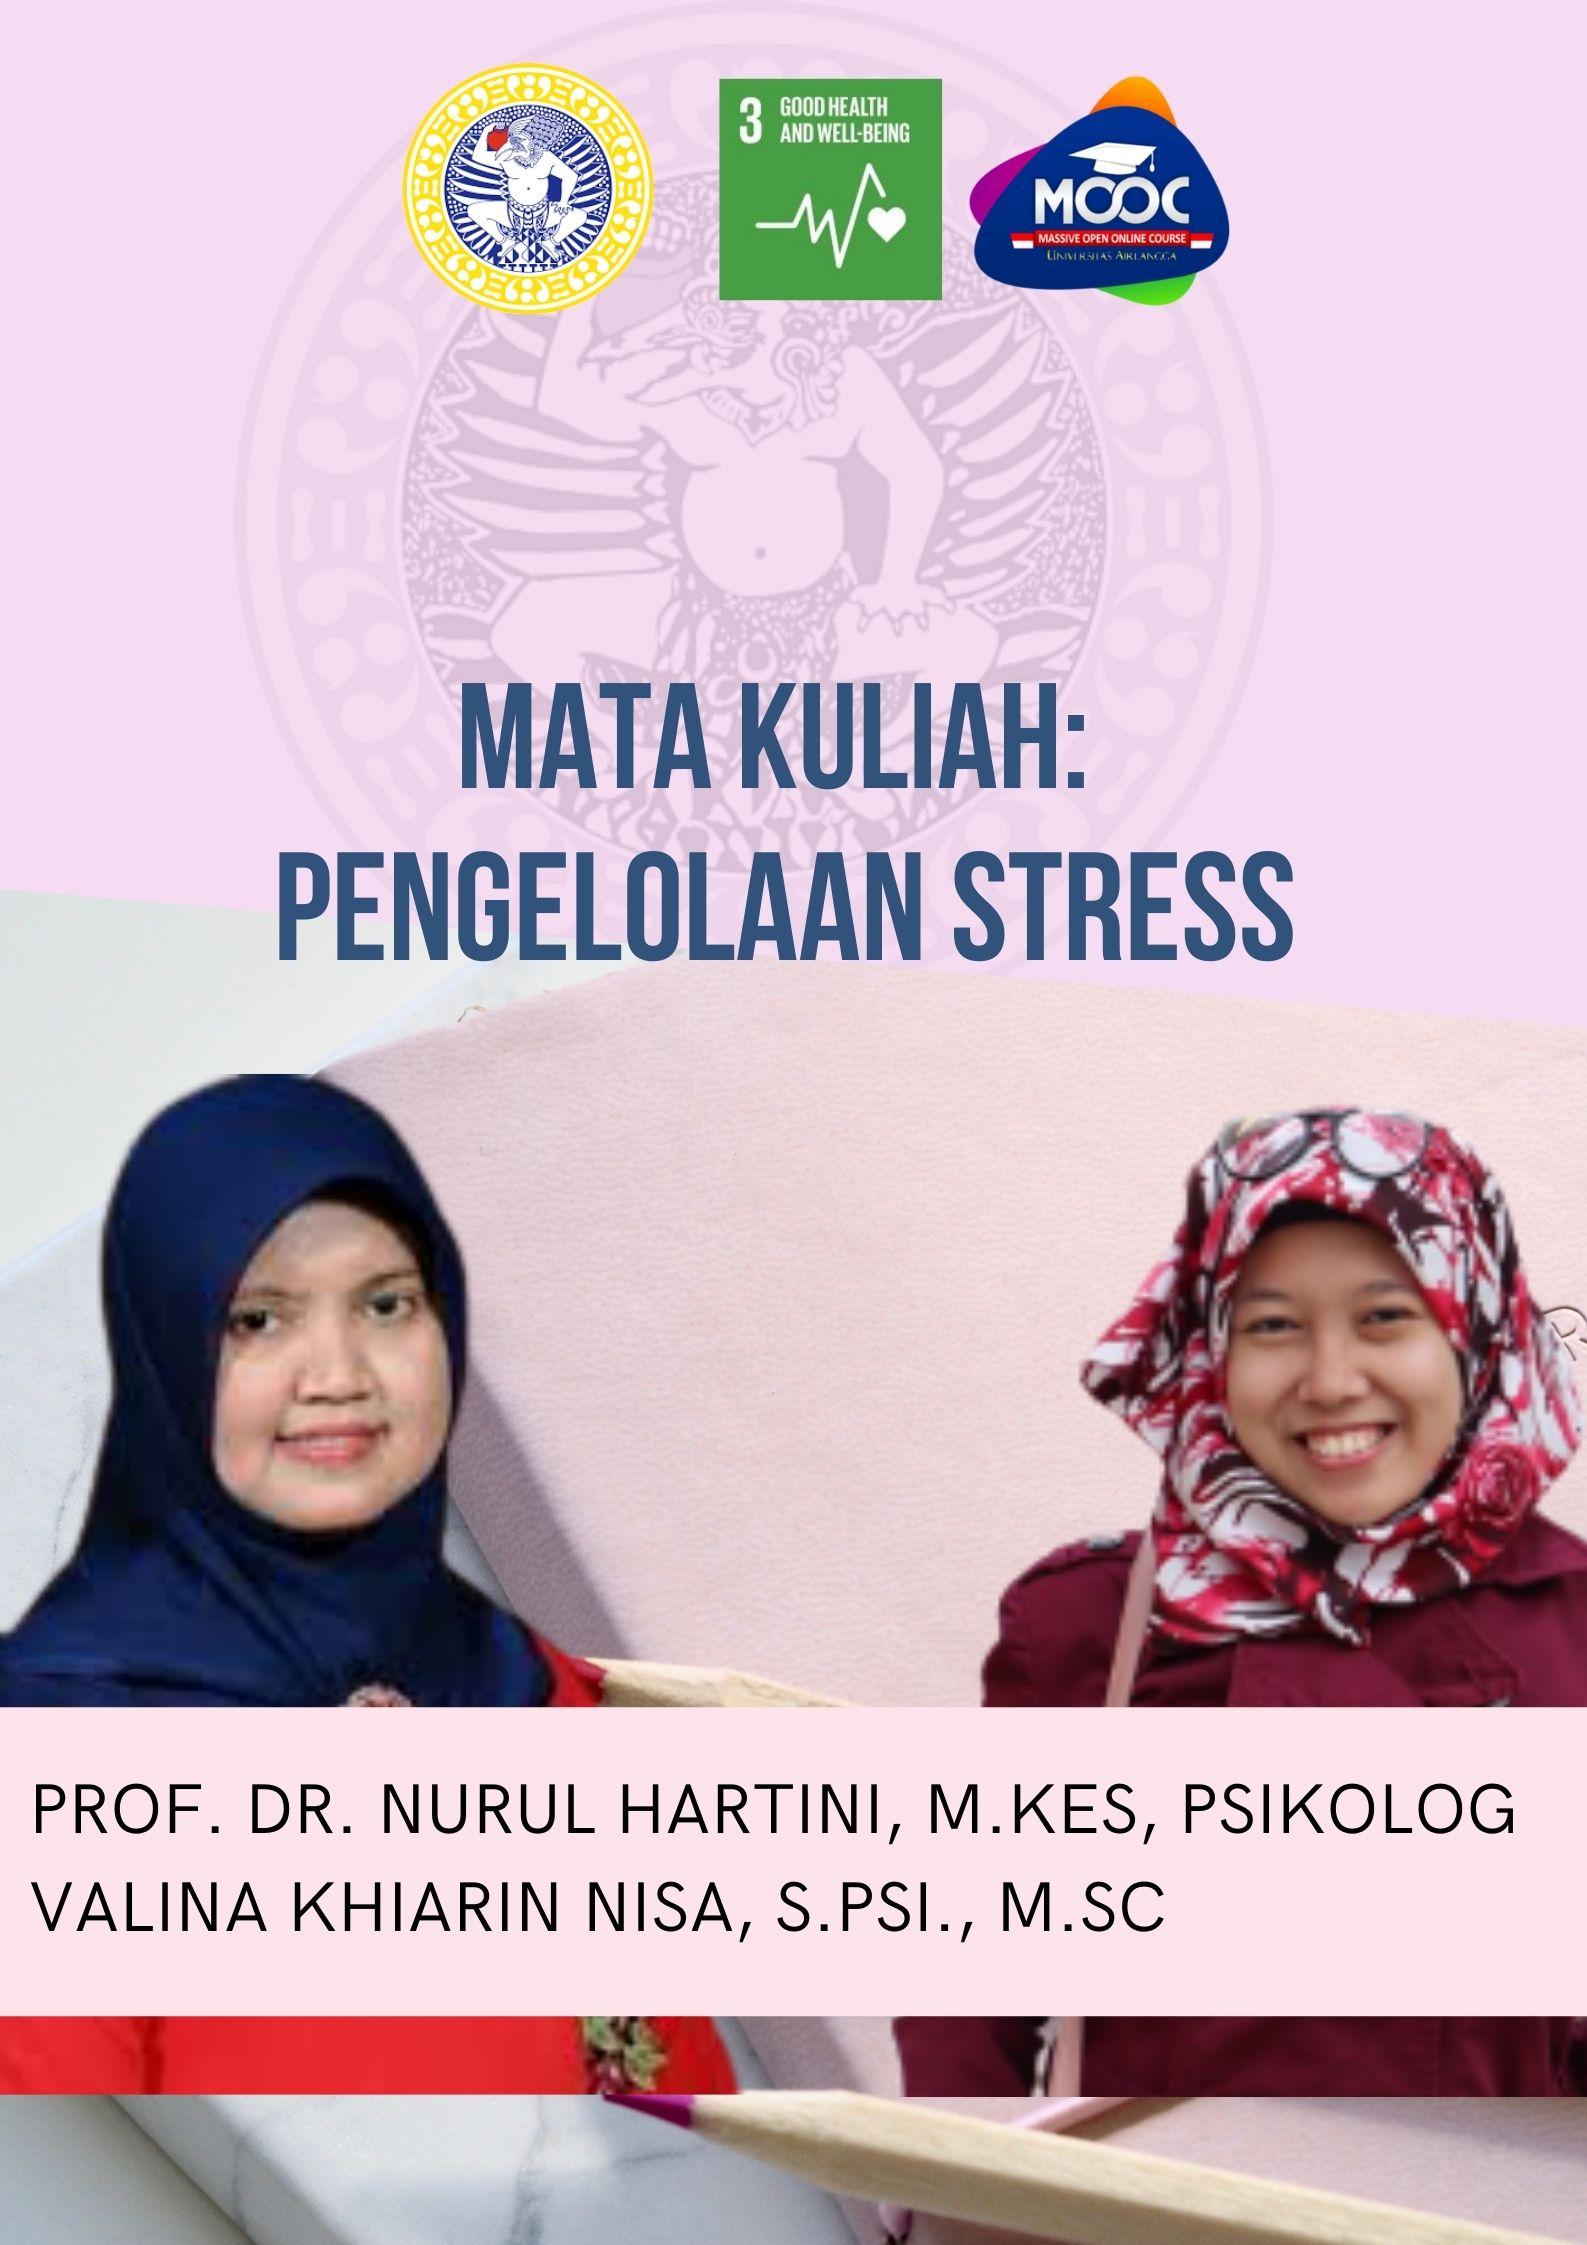 Pengelolaan Stres